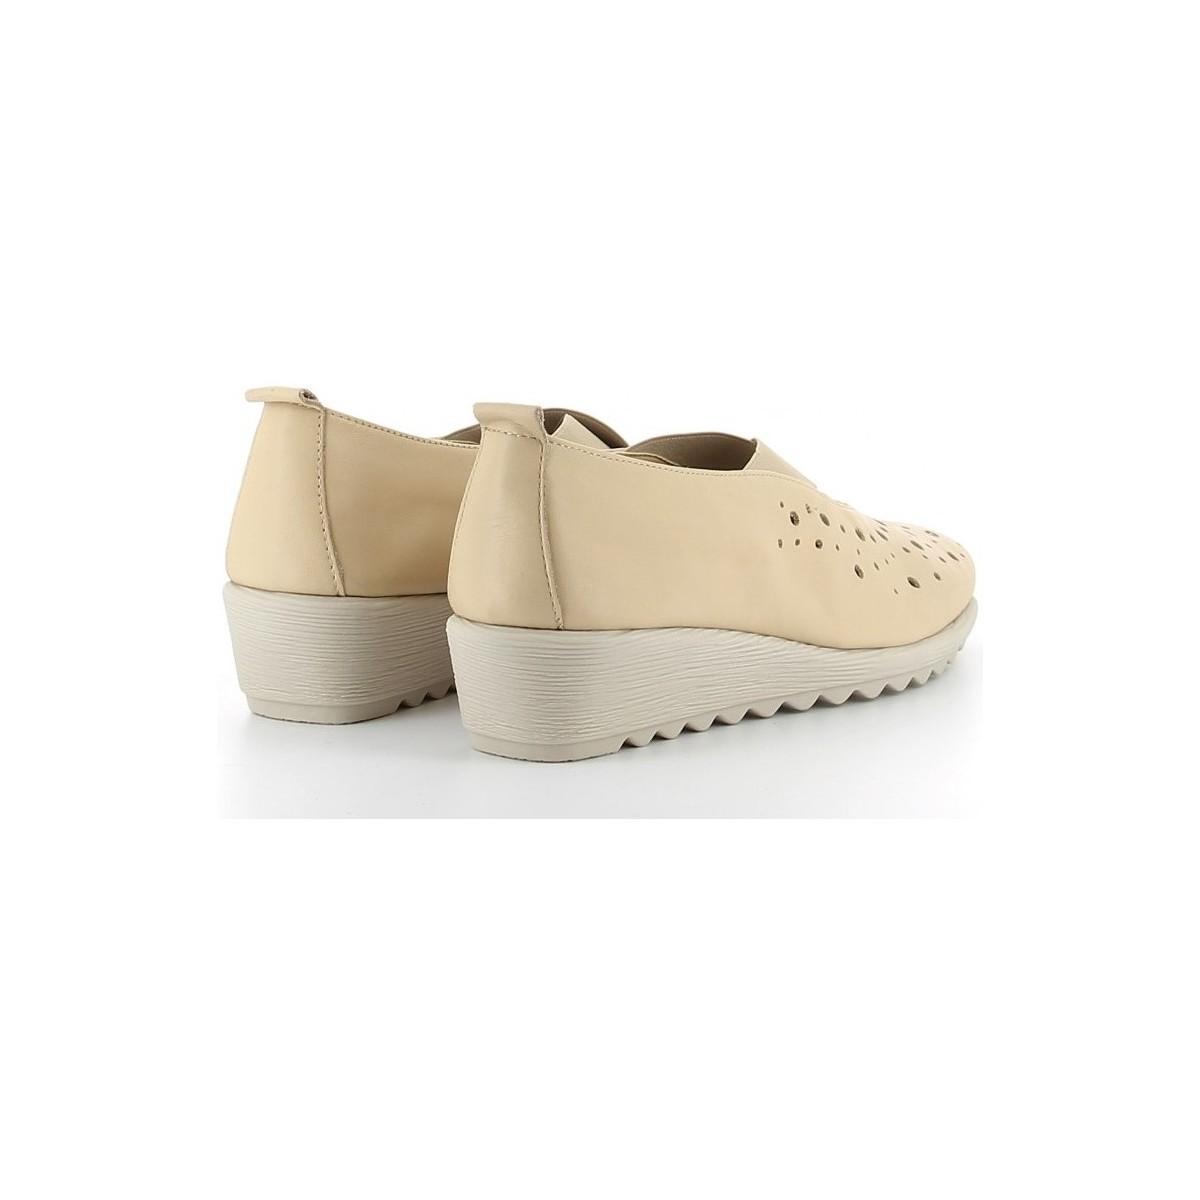 ROAD RUNNER Chaussures Unknown en coloris Neutre